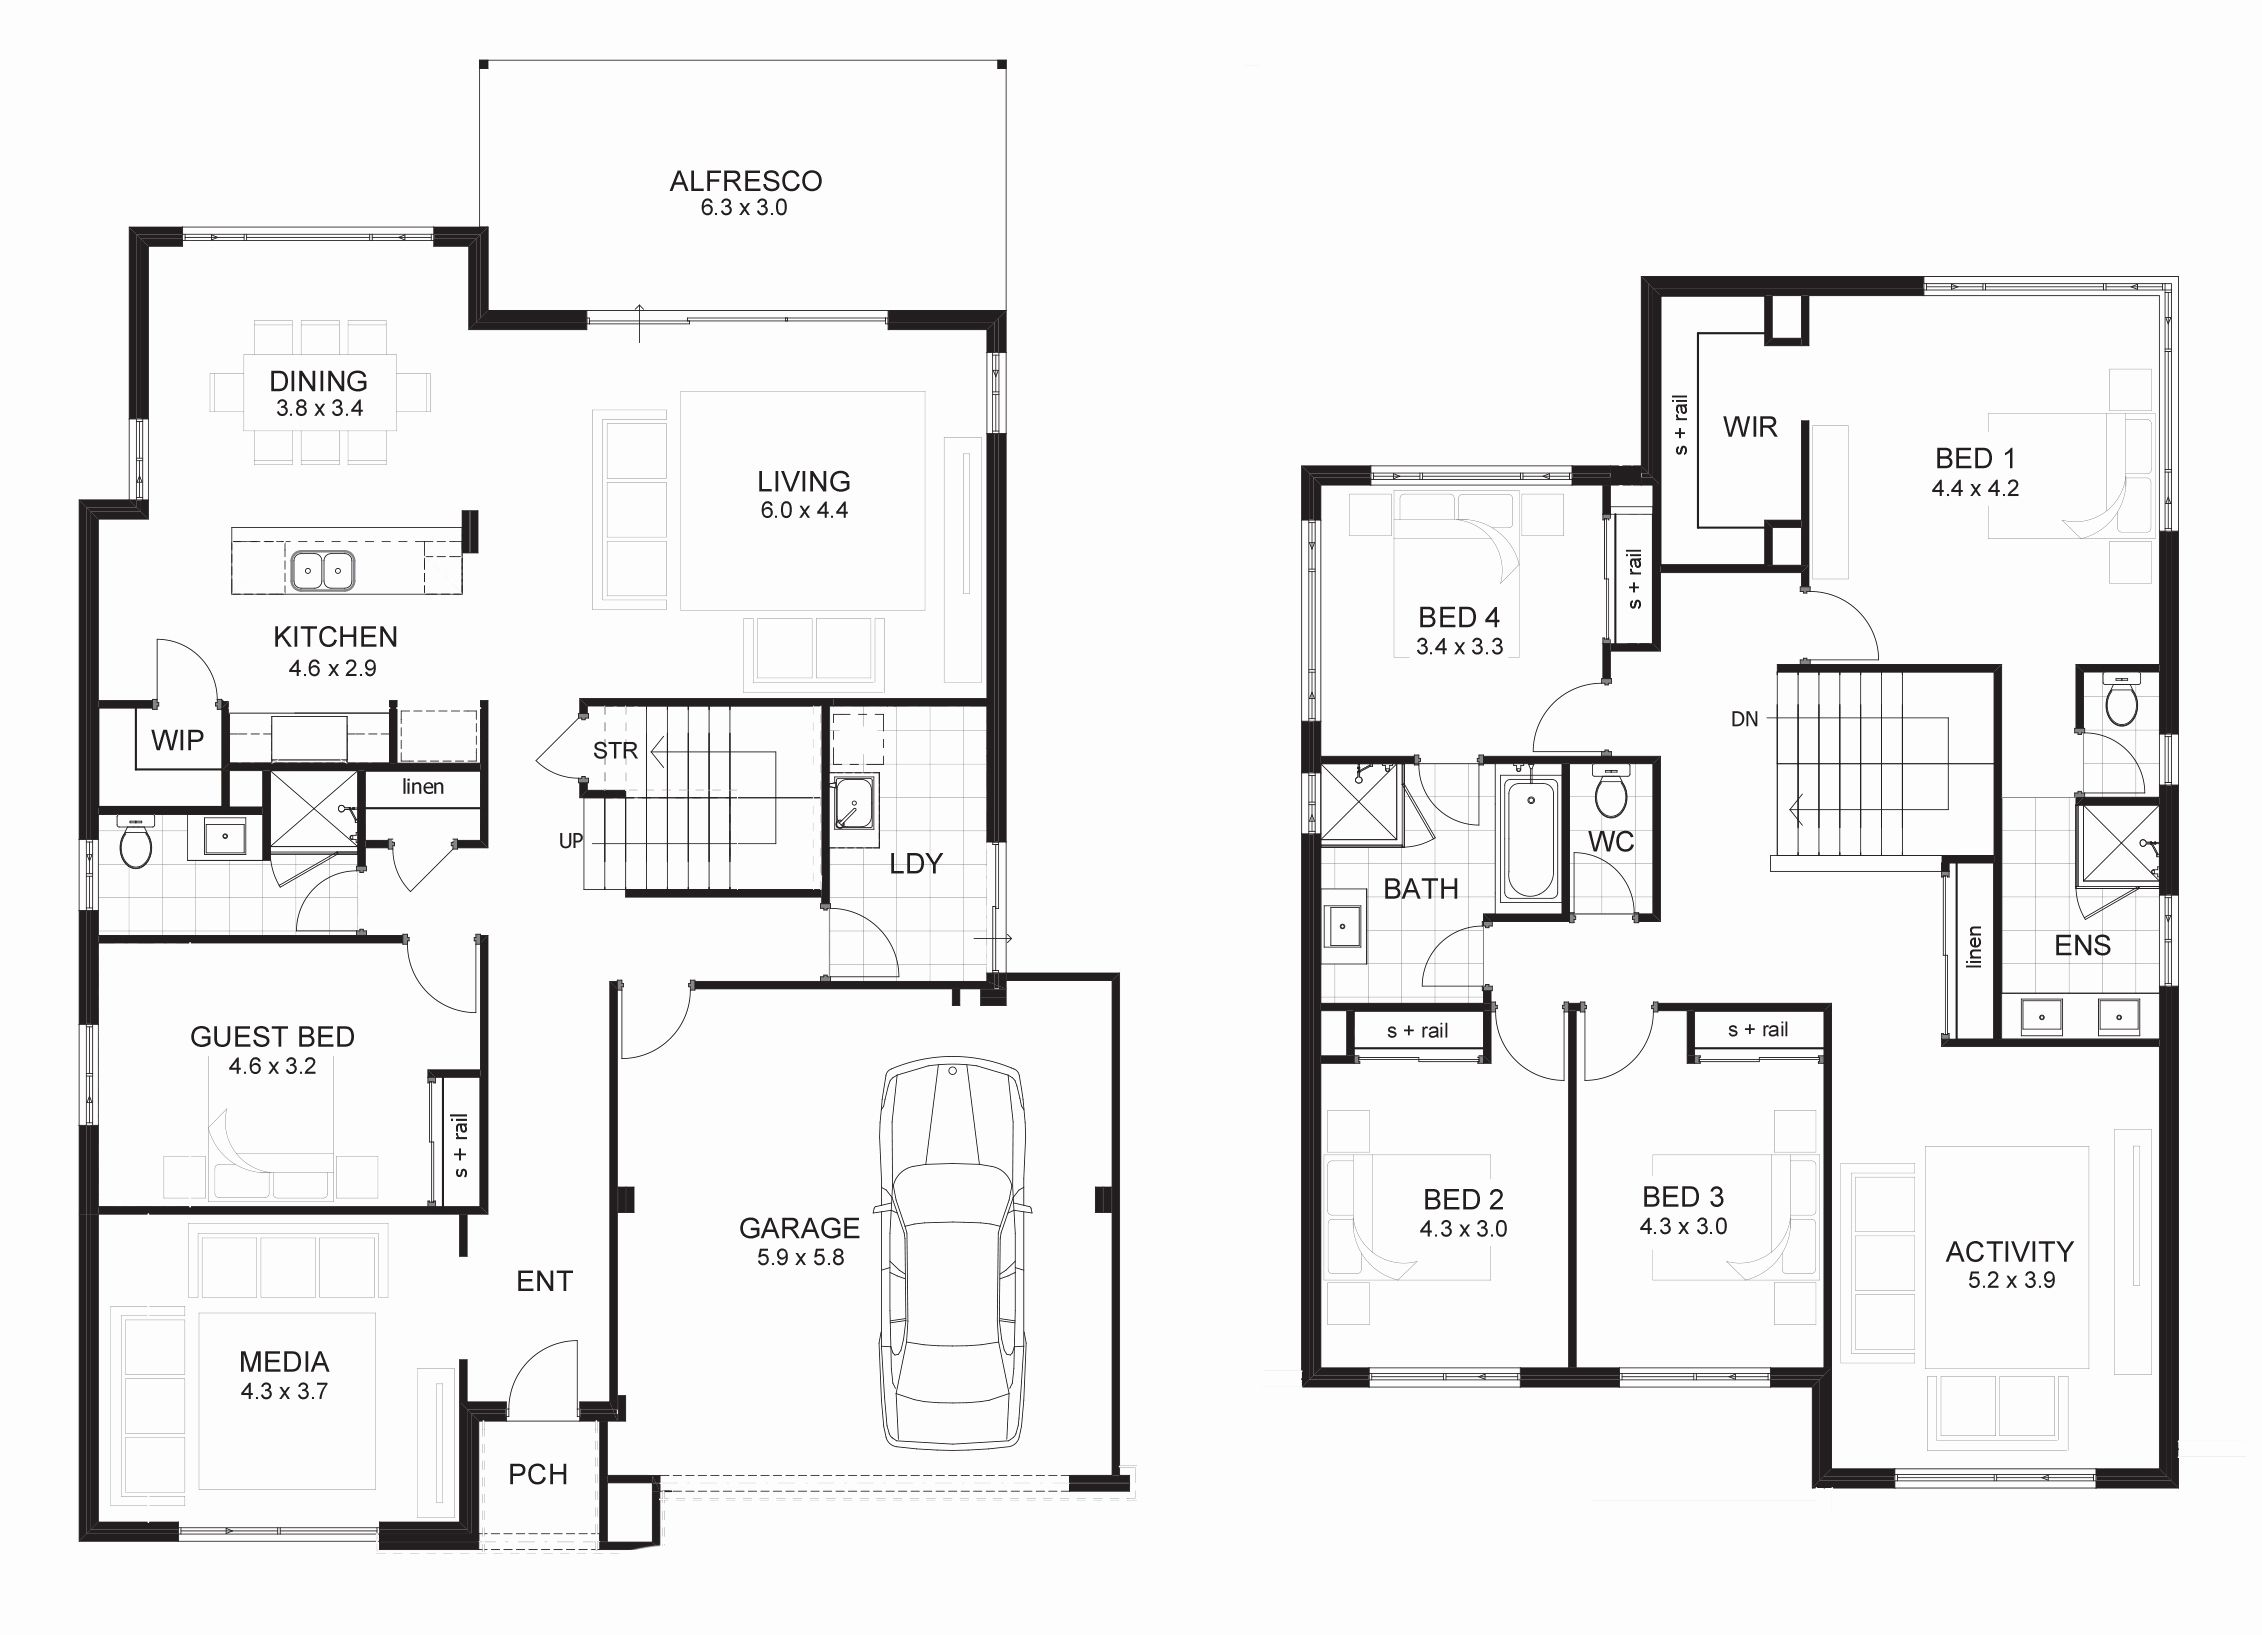 2 Storey House Floor Plan Dwg Inspirational Residential